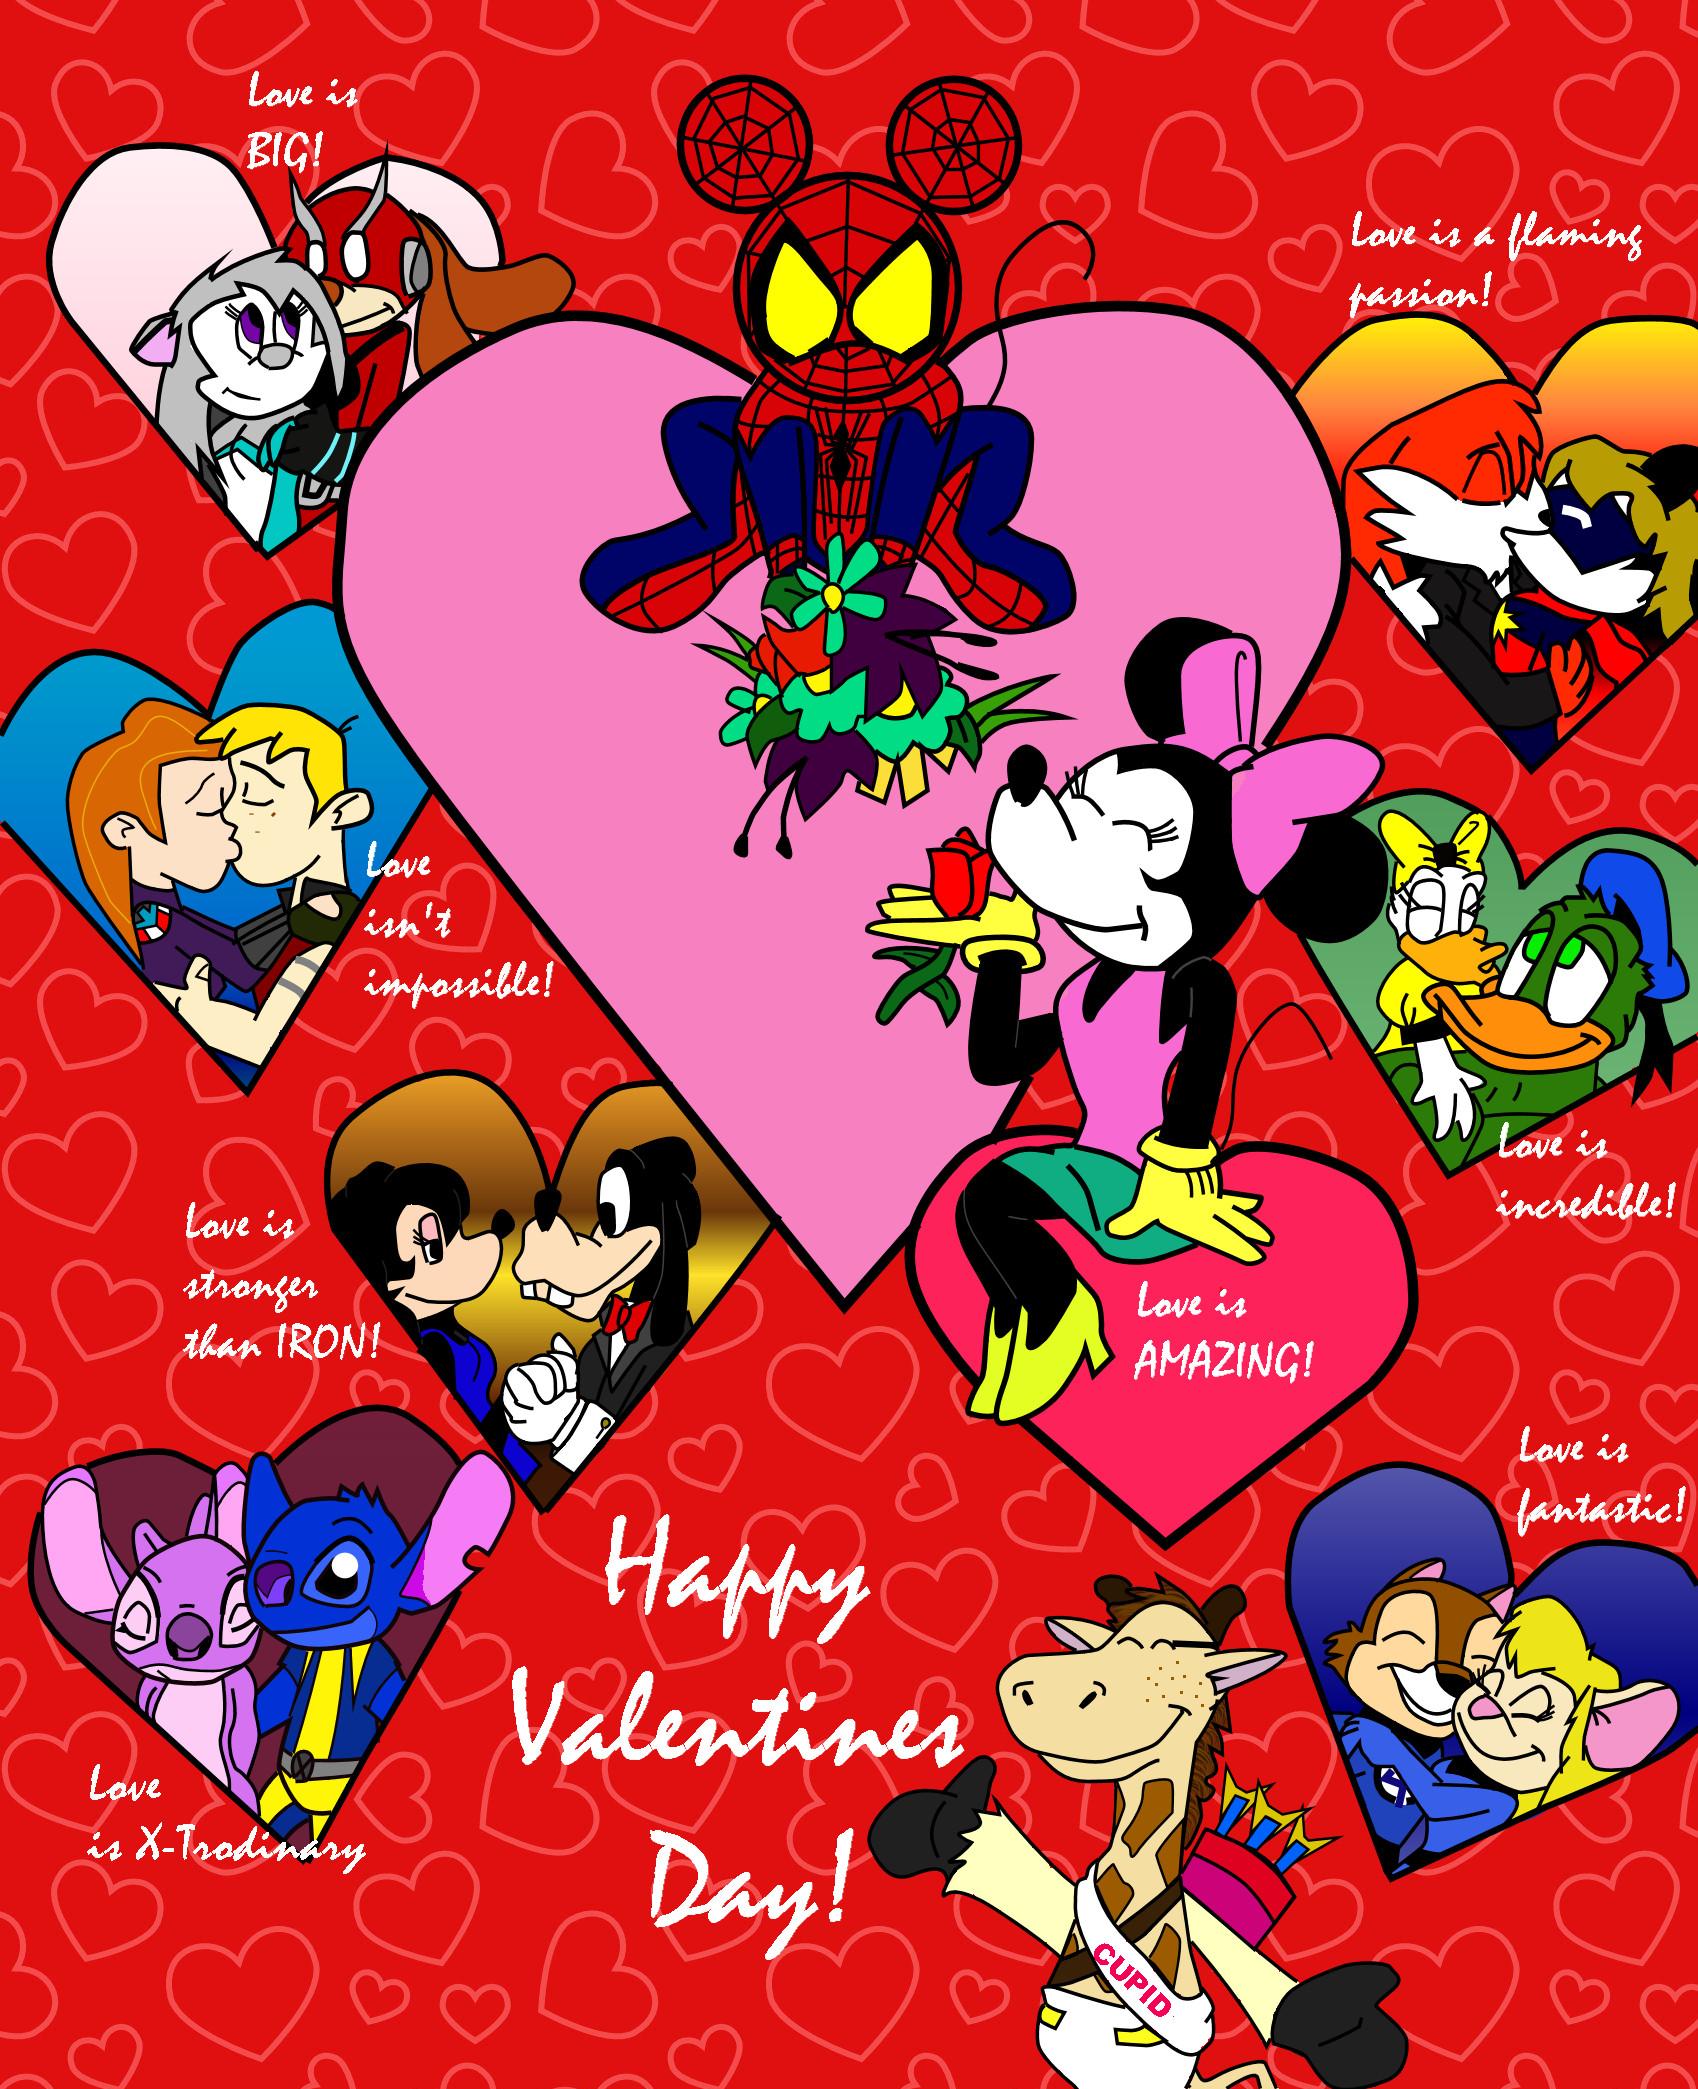 Disney Valentine's Day Wallpaper - WallpaperSafari